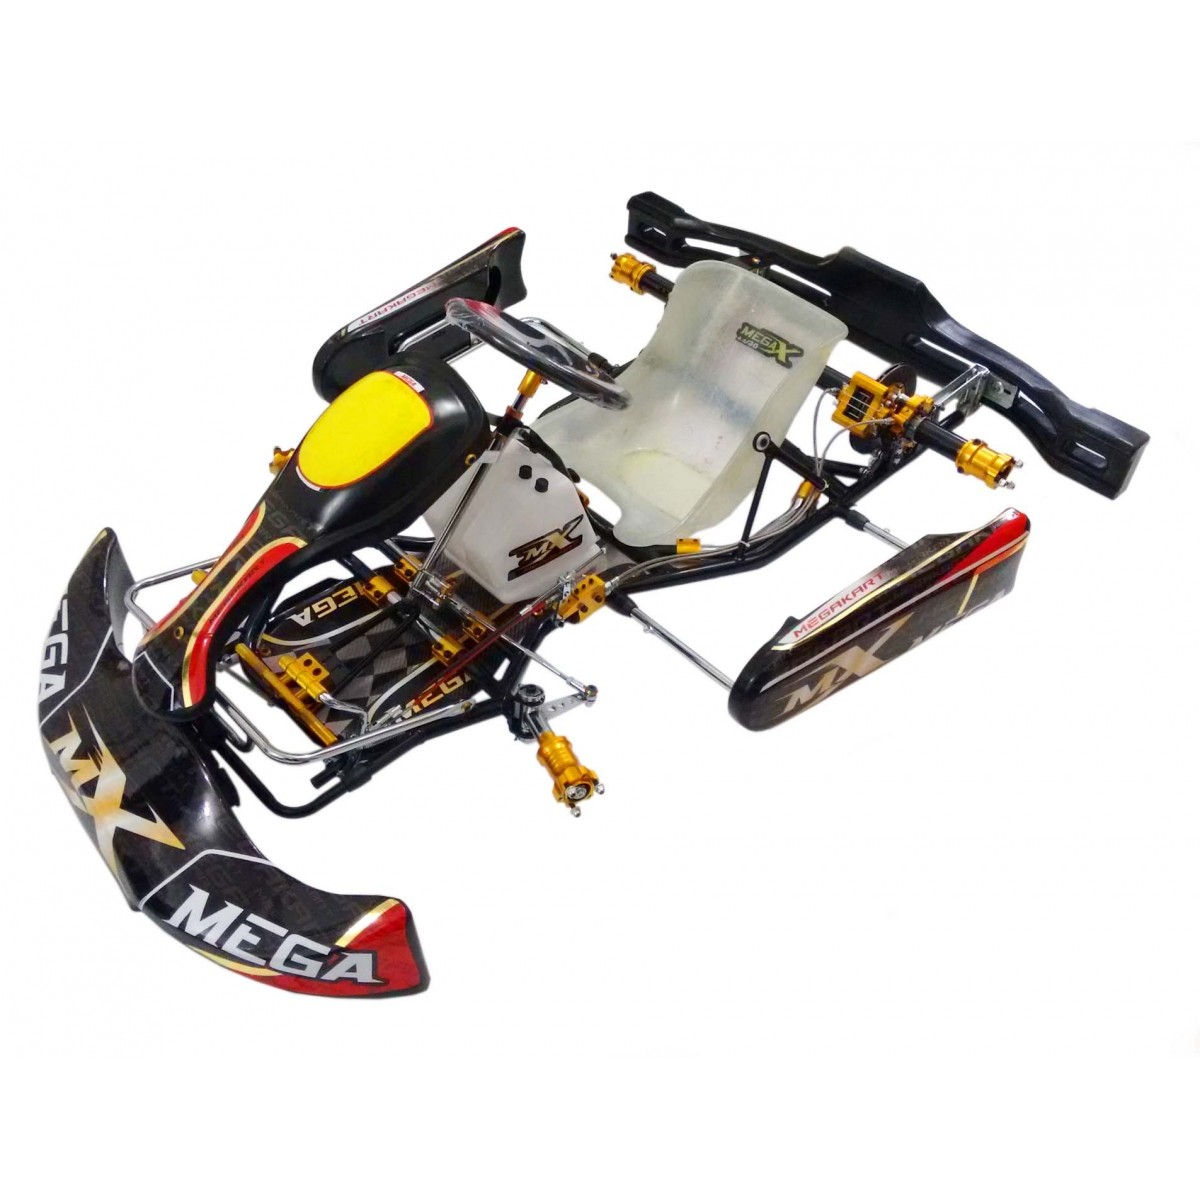 Kart Black Gold (Mangão e Sistema Linear)  - 867  - Mega Kart